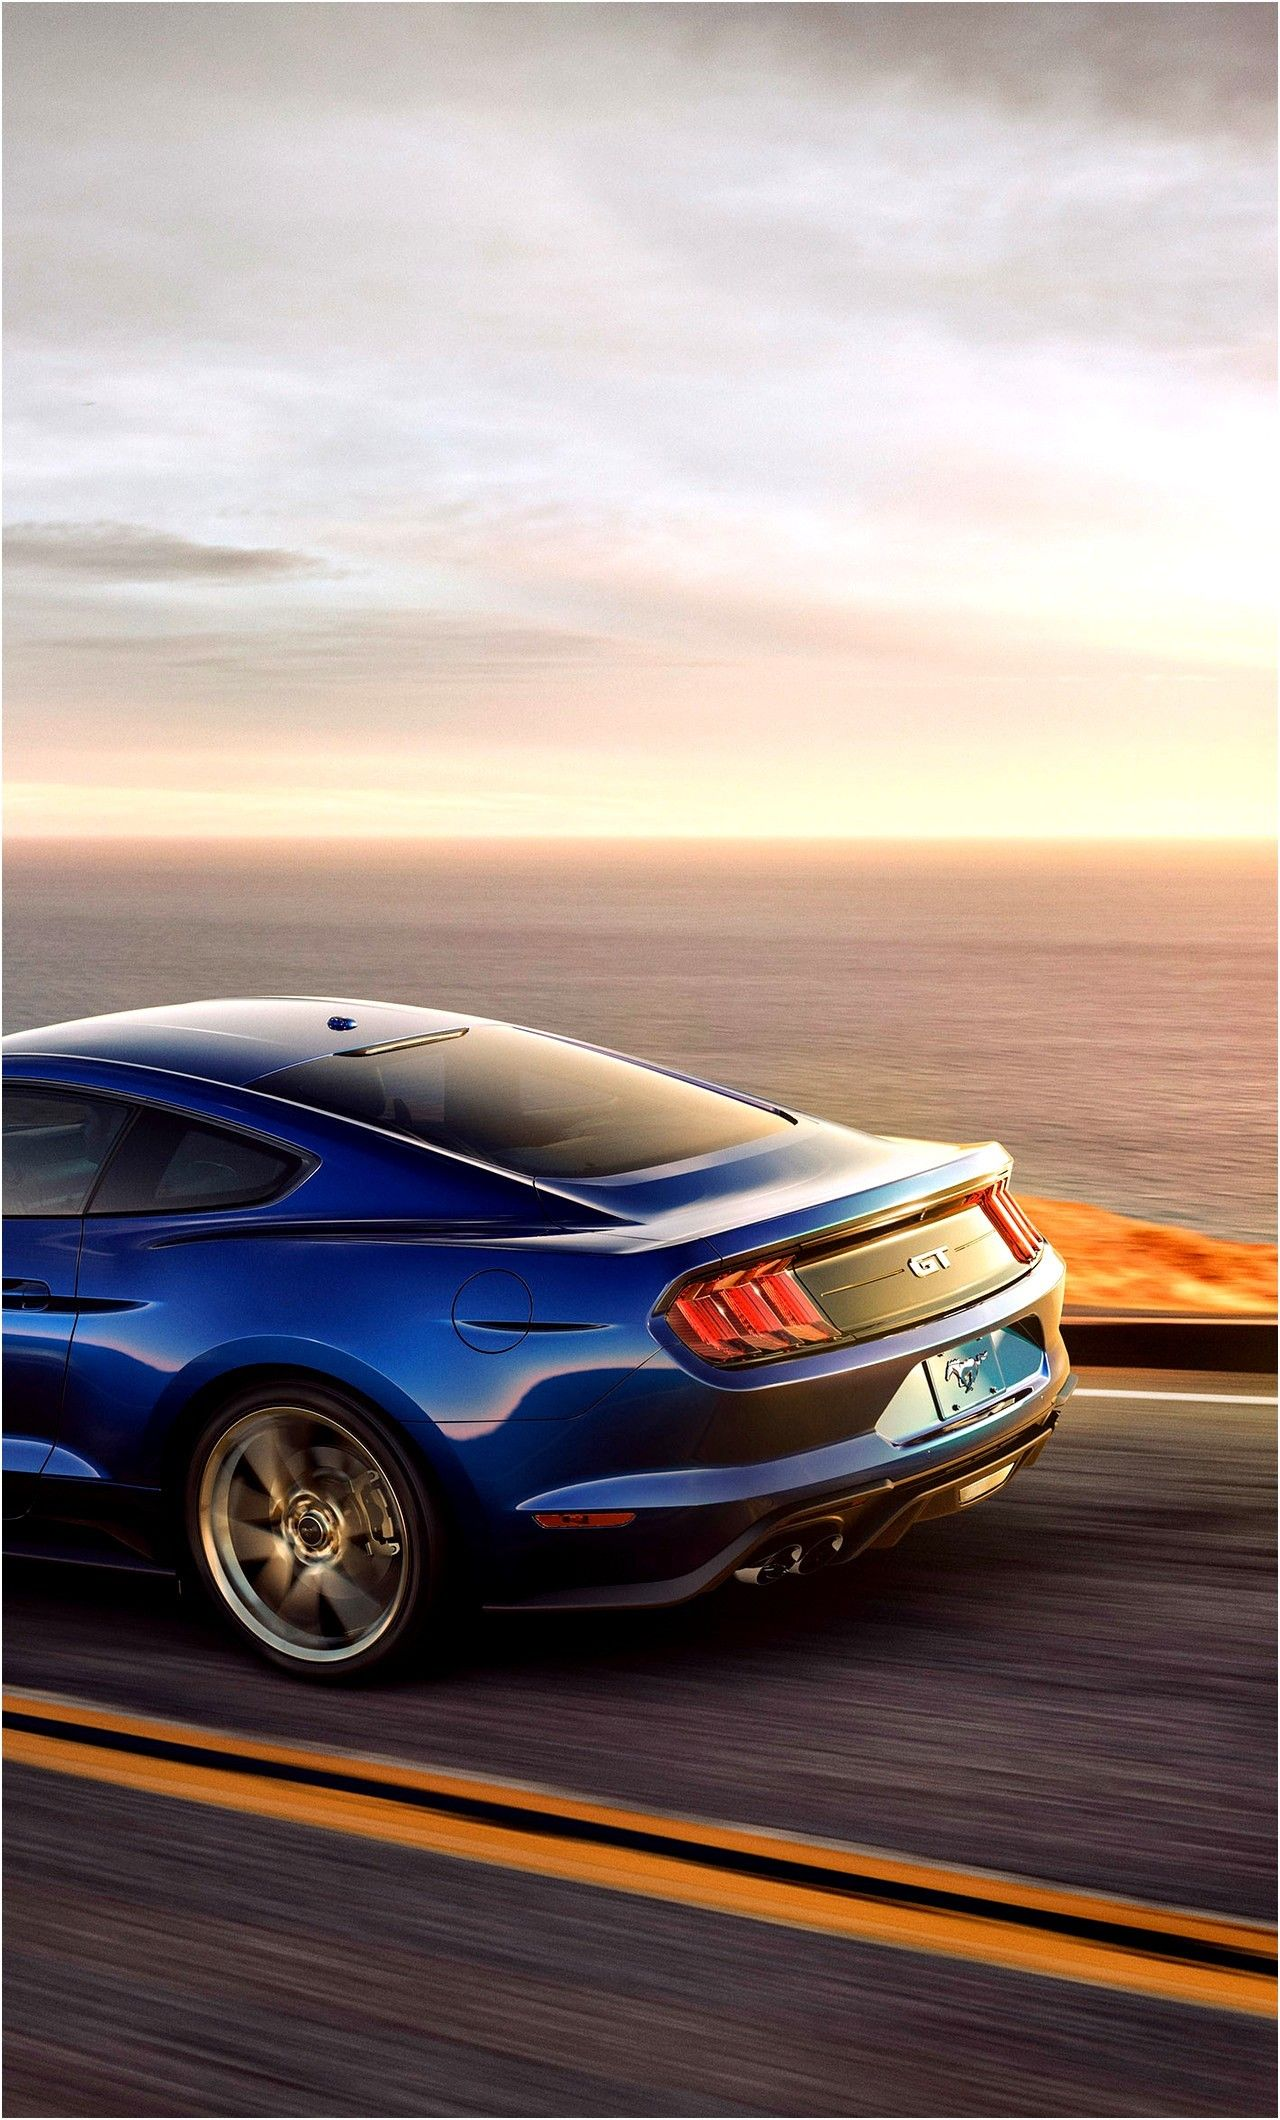 Full Hd Mustang Iphone Wallpaper Ipcwallpapers Mustang Mustang Iphone Wallpaper Muscle Cars Mustang